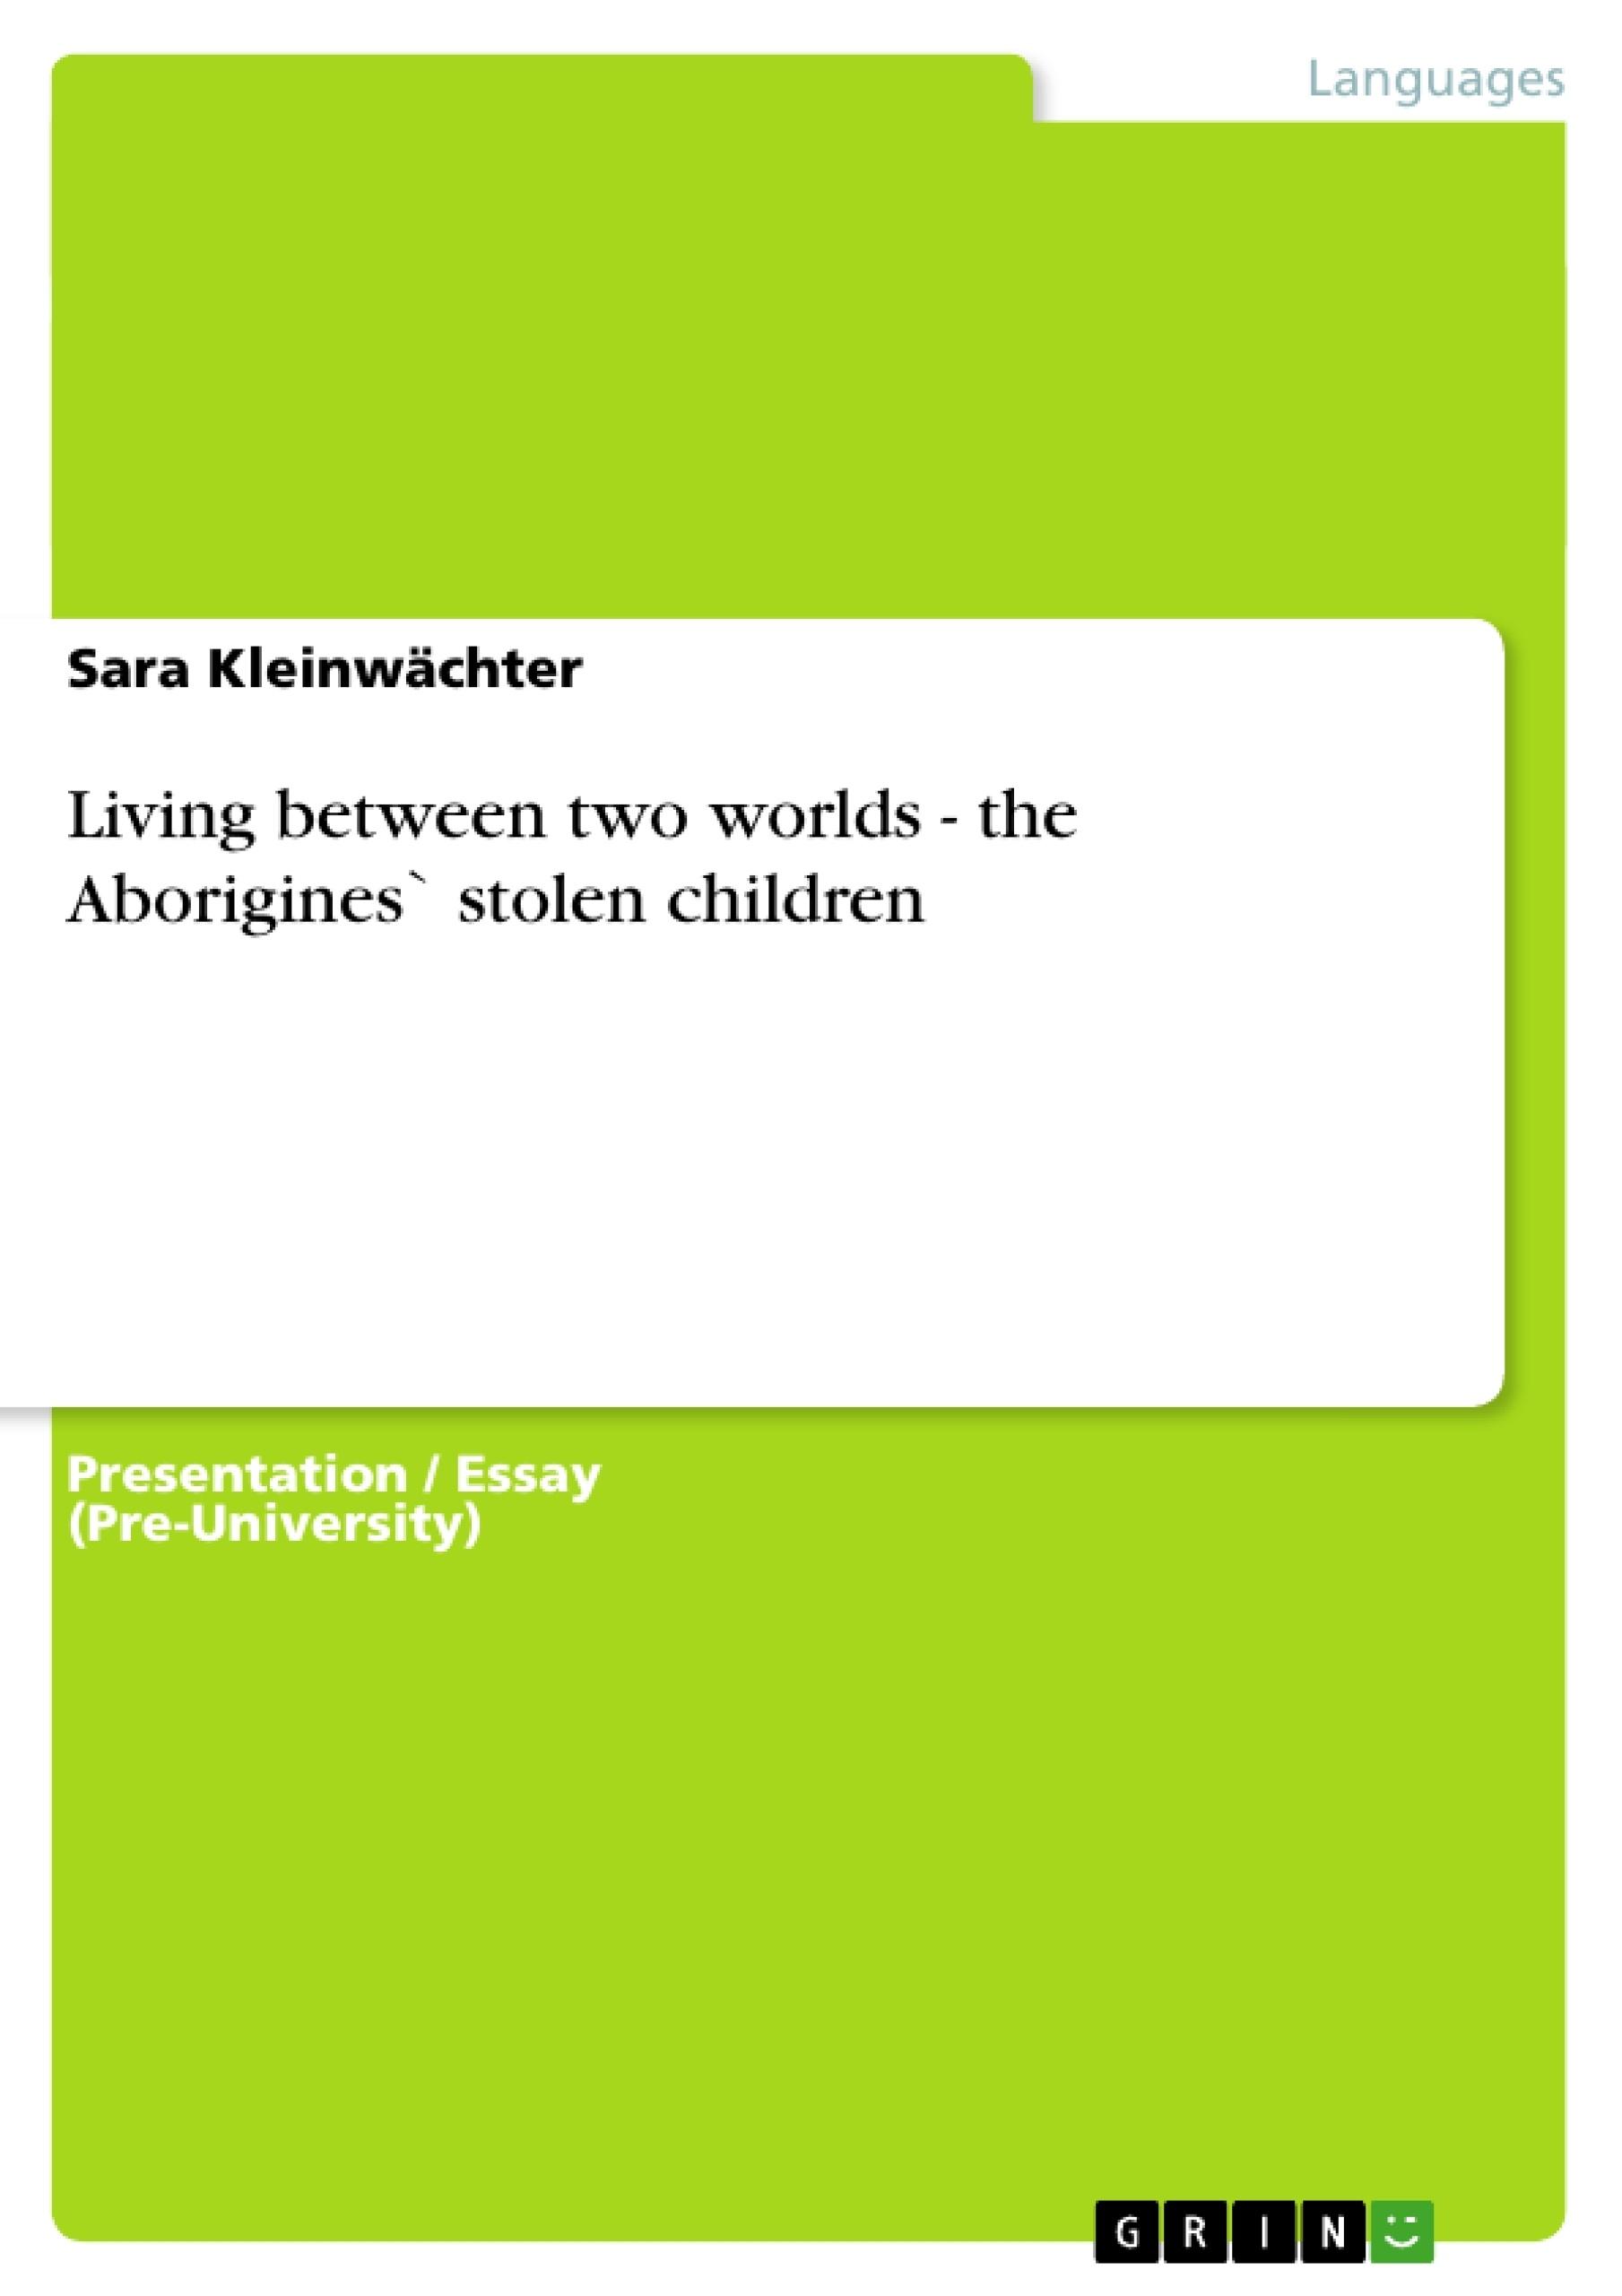 Title: Living between two worlds - the Aborigines` stolen children